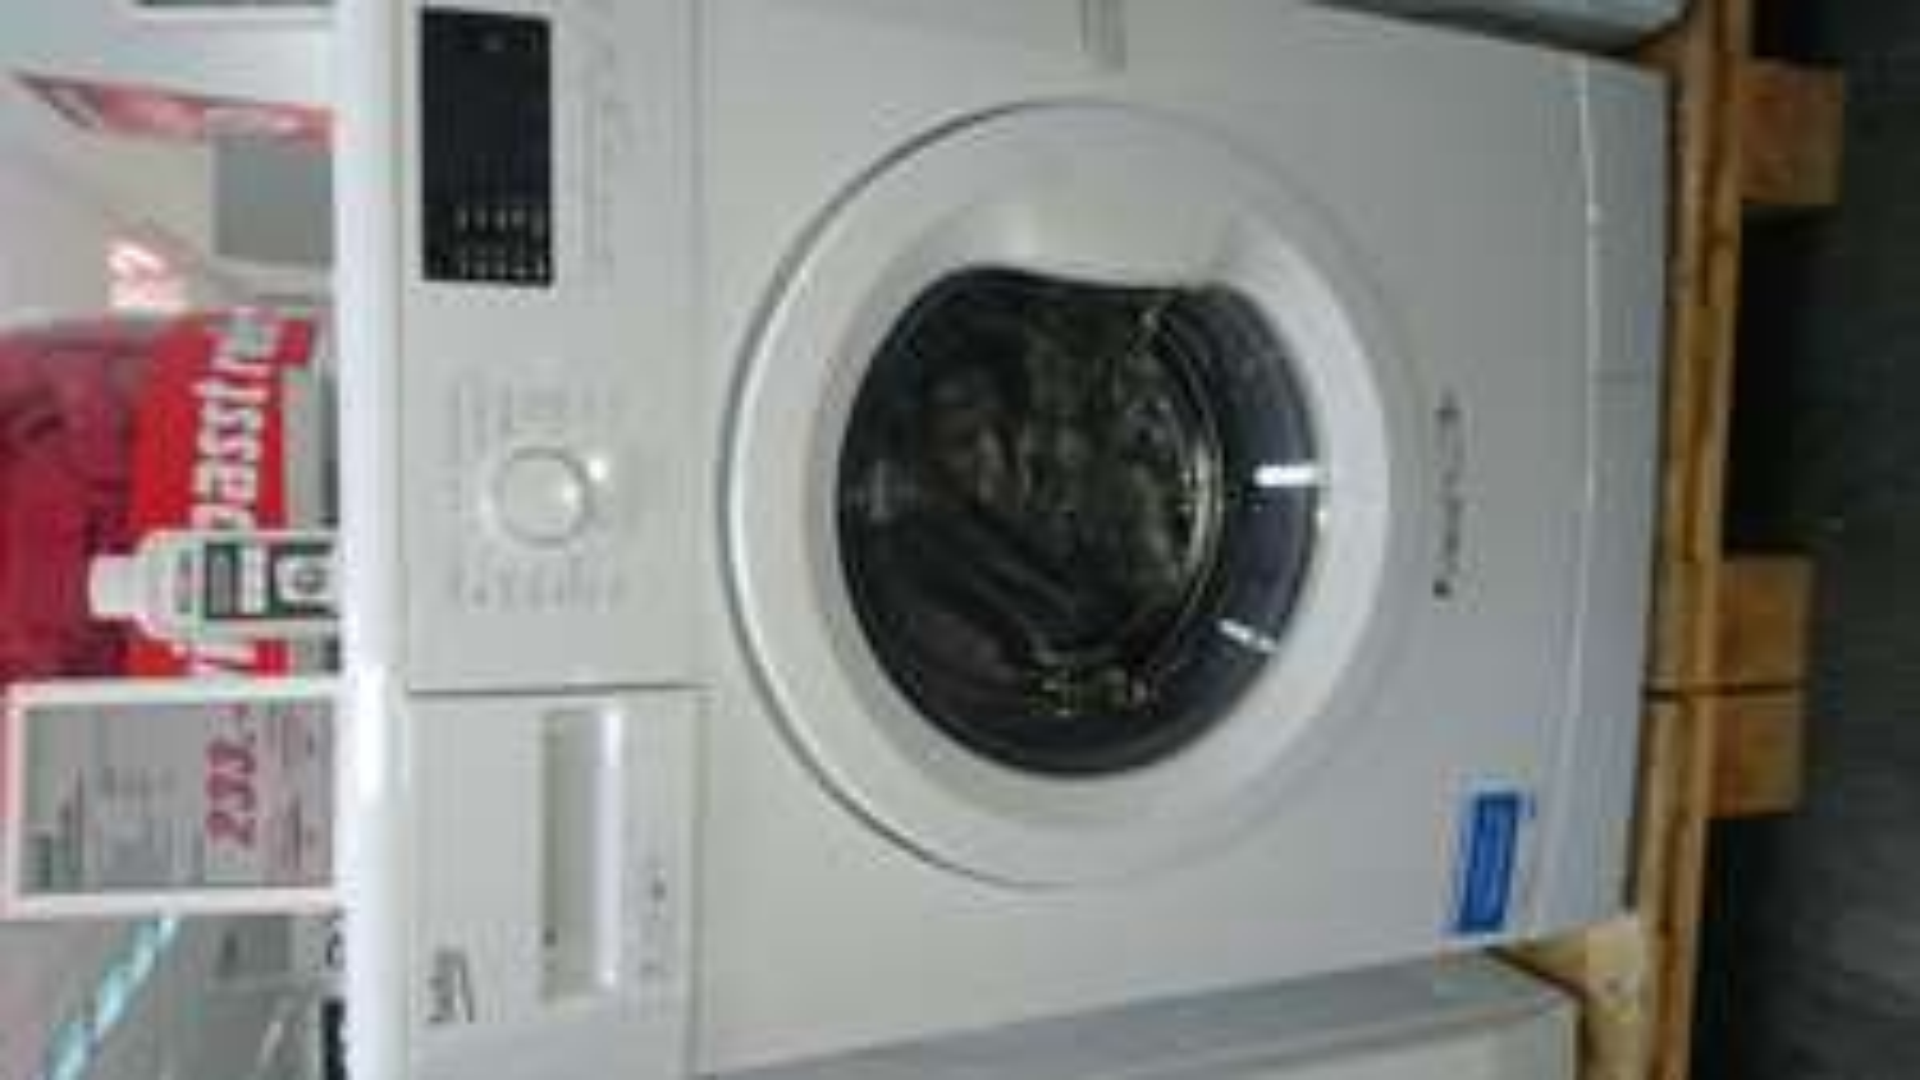 BEKO Waschmaschine WMB 71433 UPTE bei Media Markt Köln City, Hohestr. 121, 50667 Köln